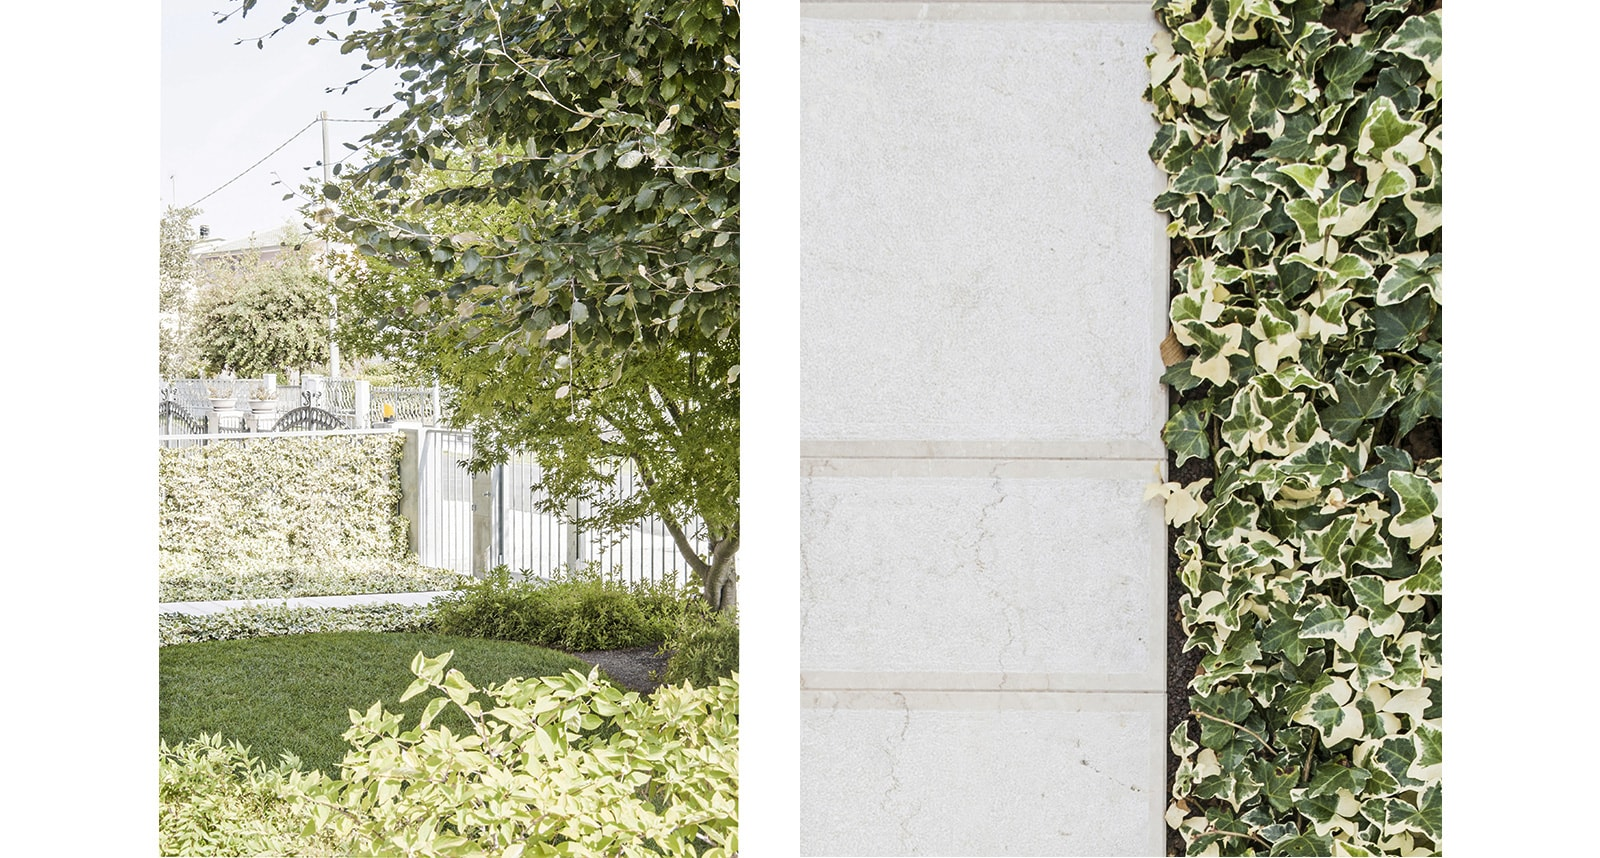 casa-giardino-via-berzuini-34-garden